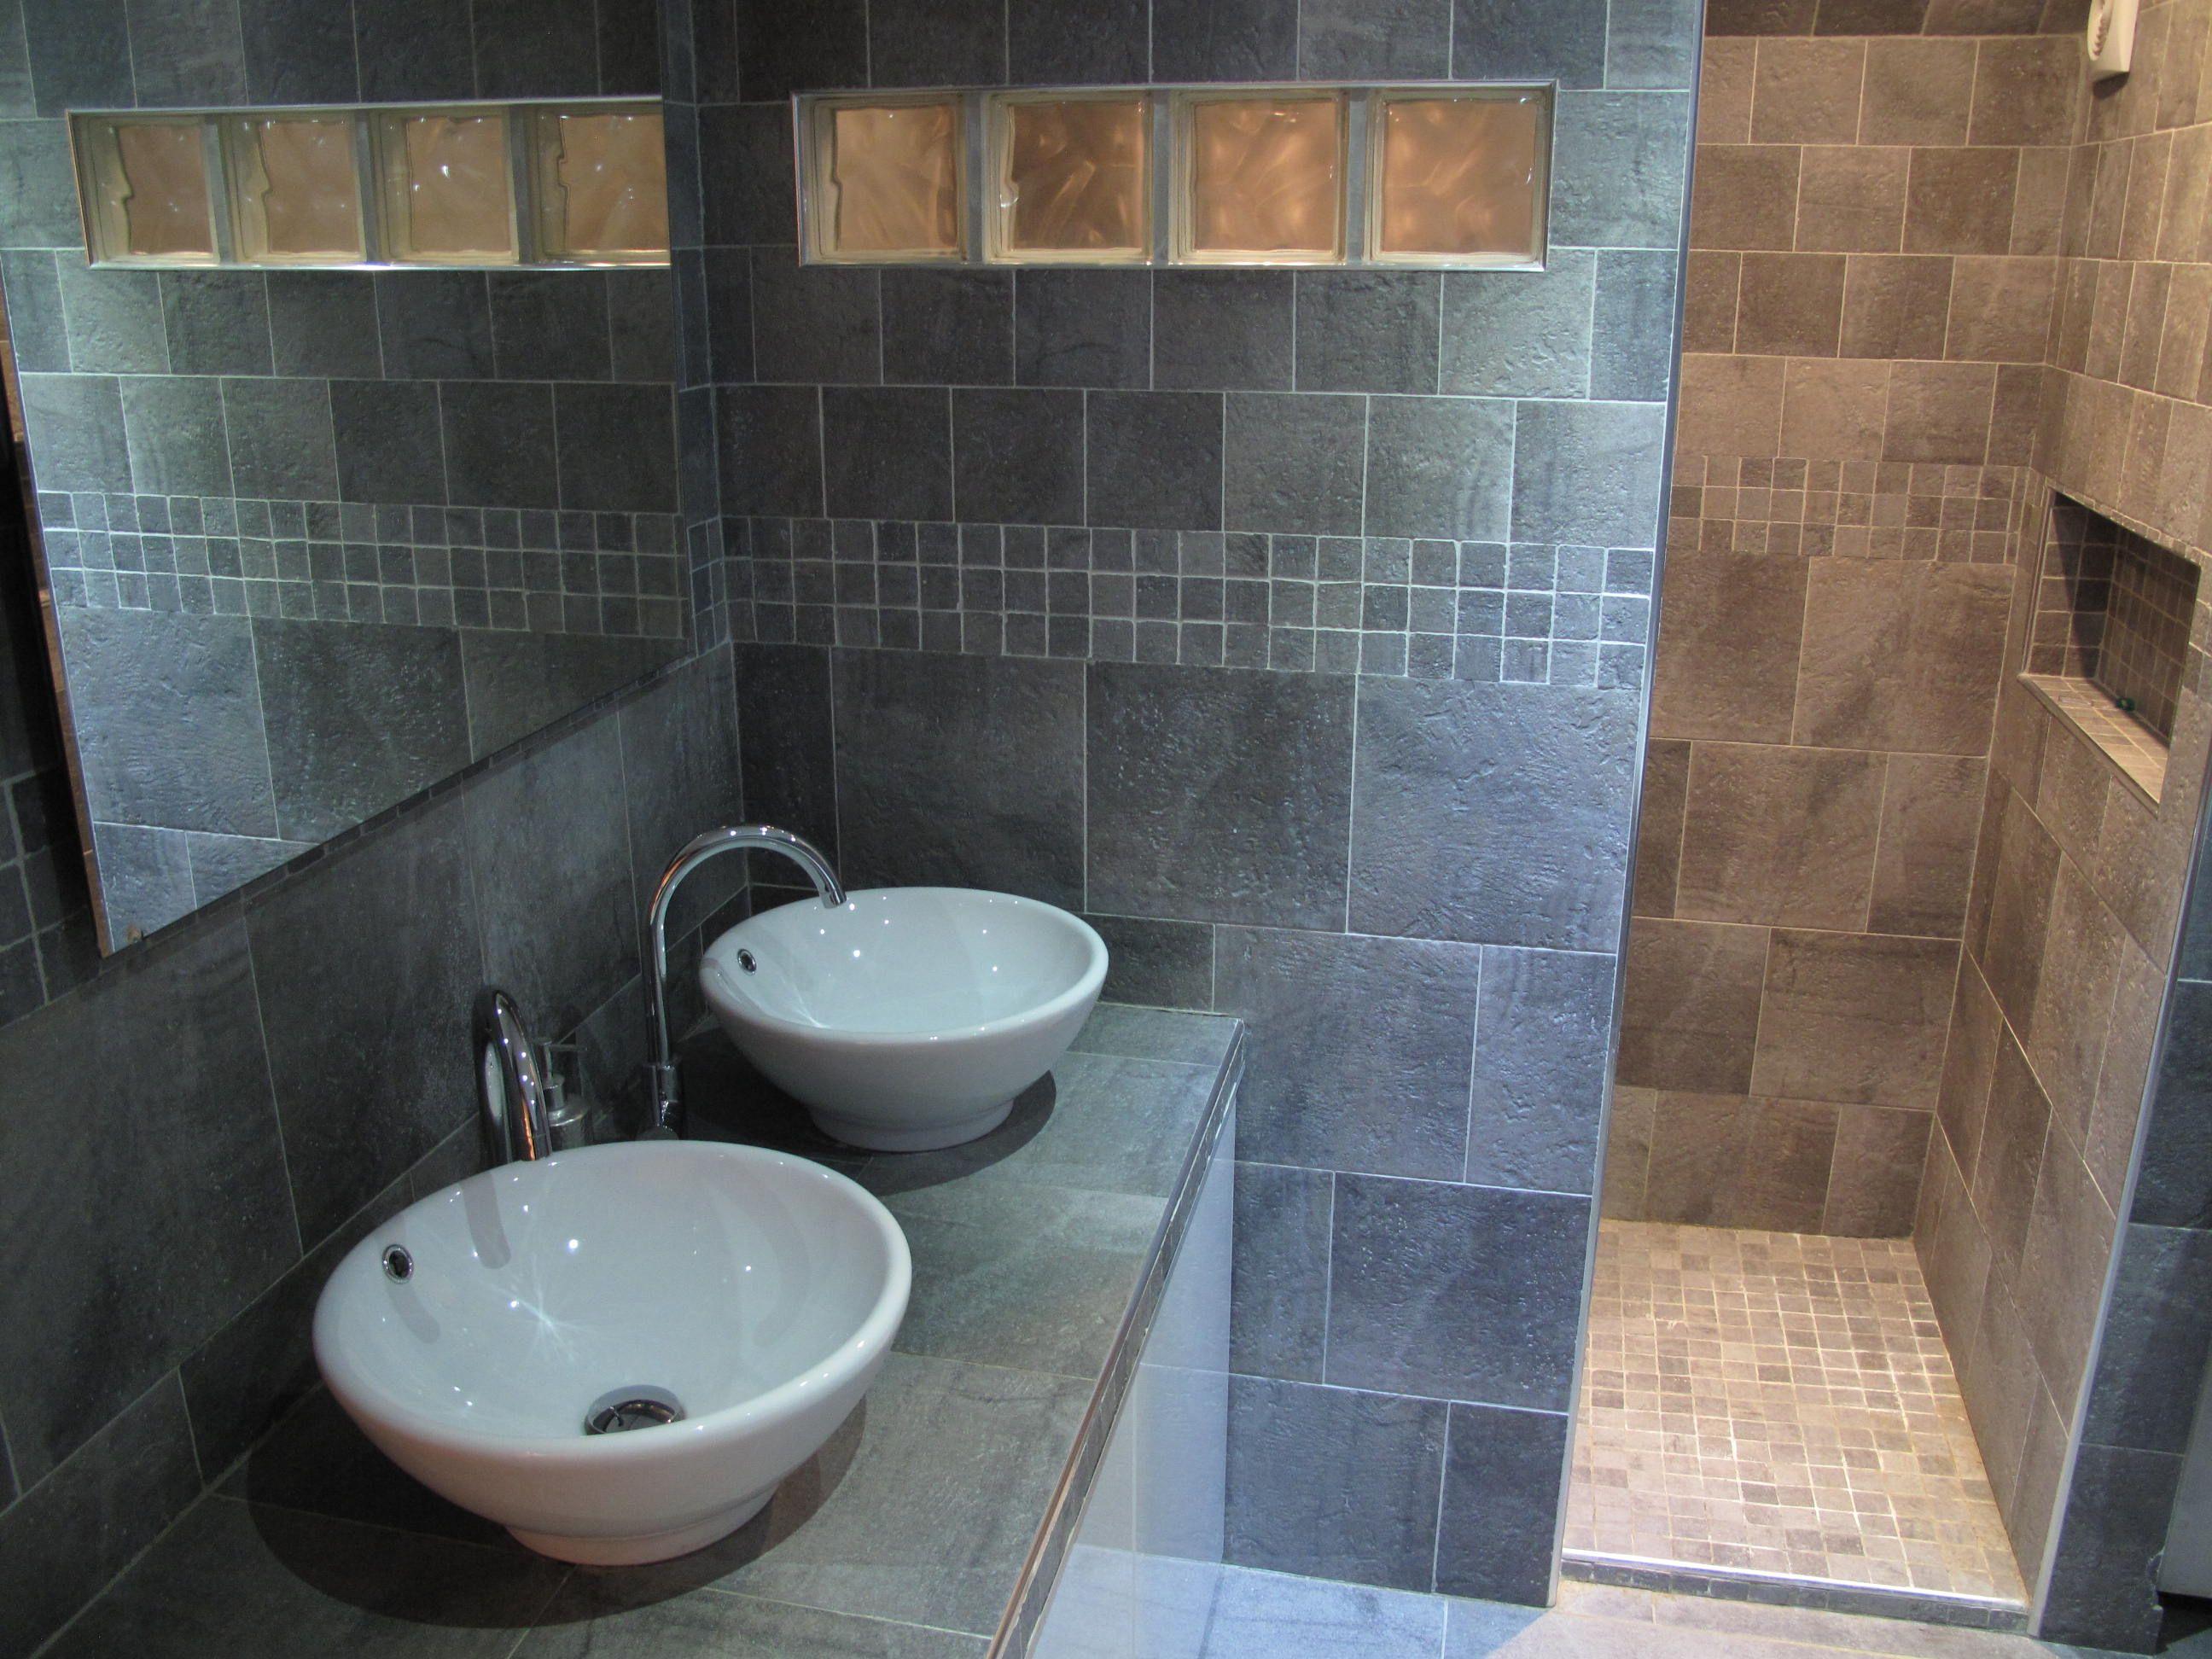 12 awesome plan vasque salle de bain a carreler images salle de bain pinterest vasque. Black Bedroom Furniture Sets. Home Design Ideas